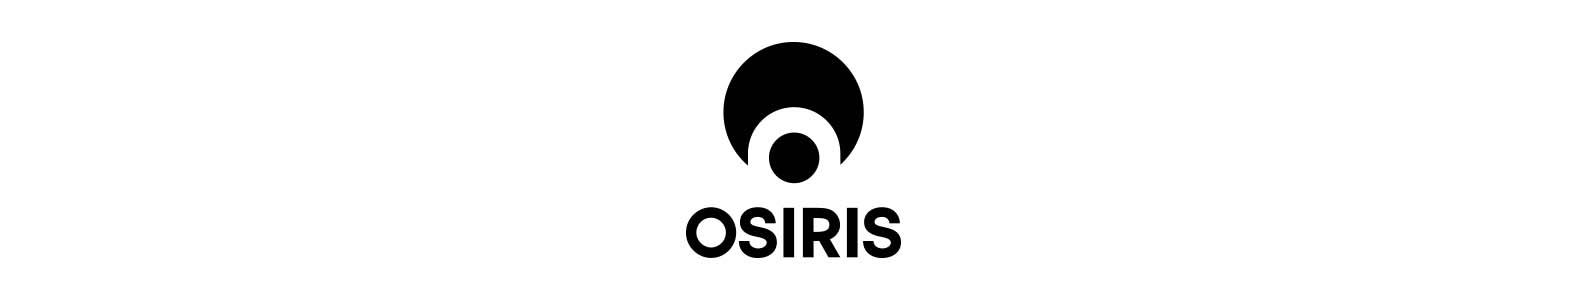 Osiris brand header image